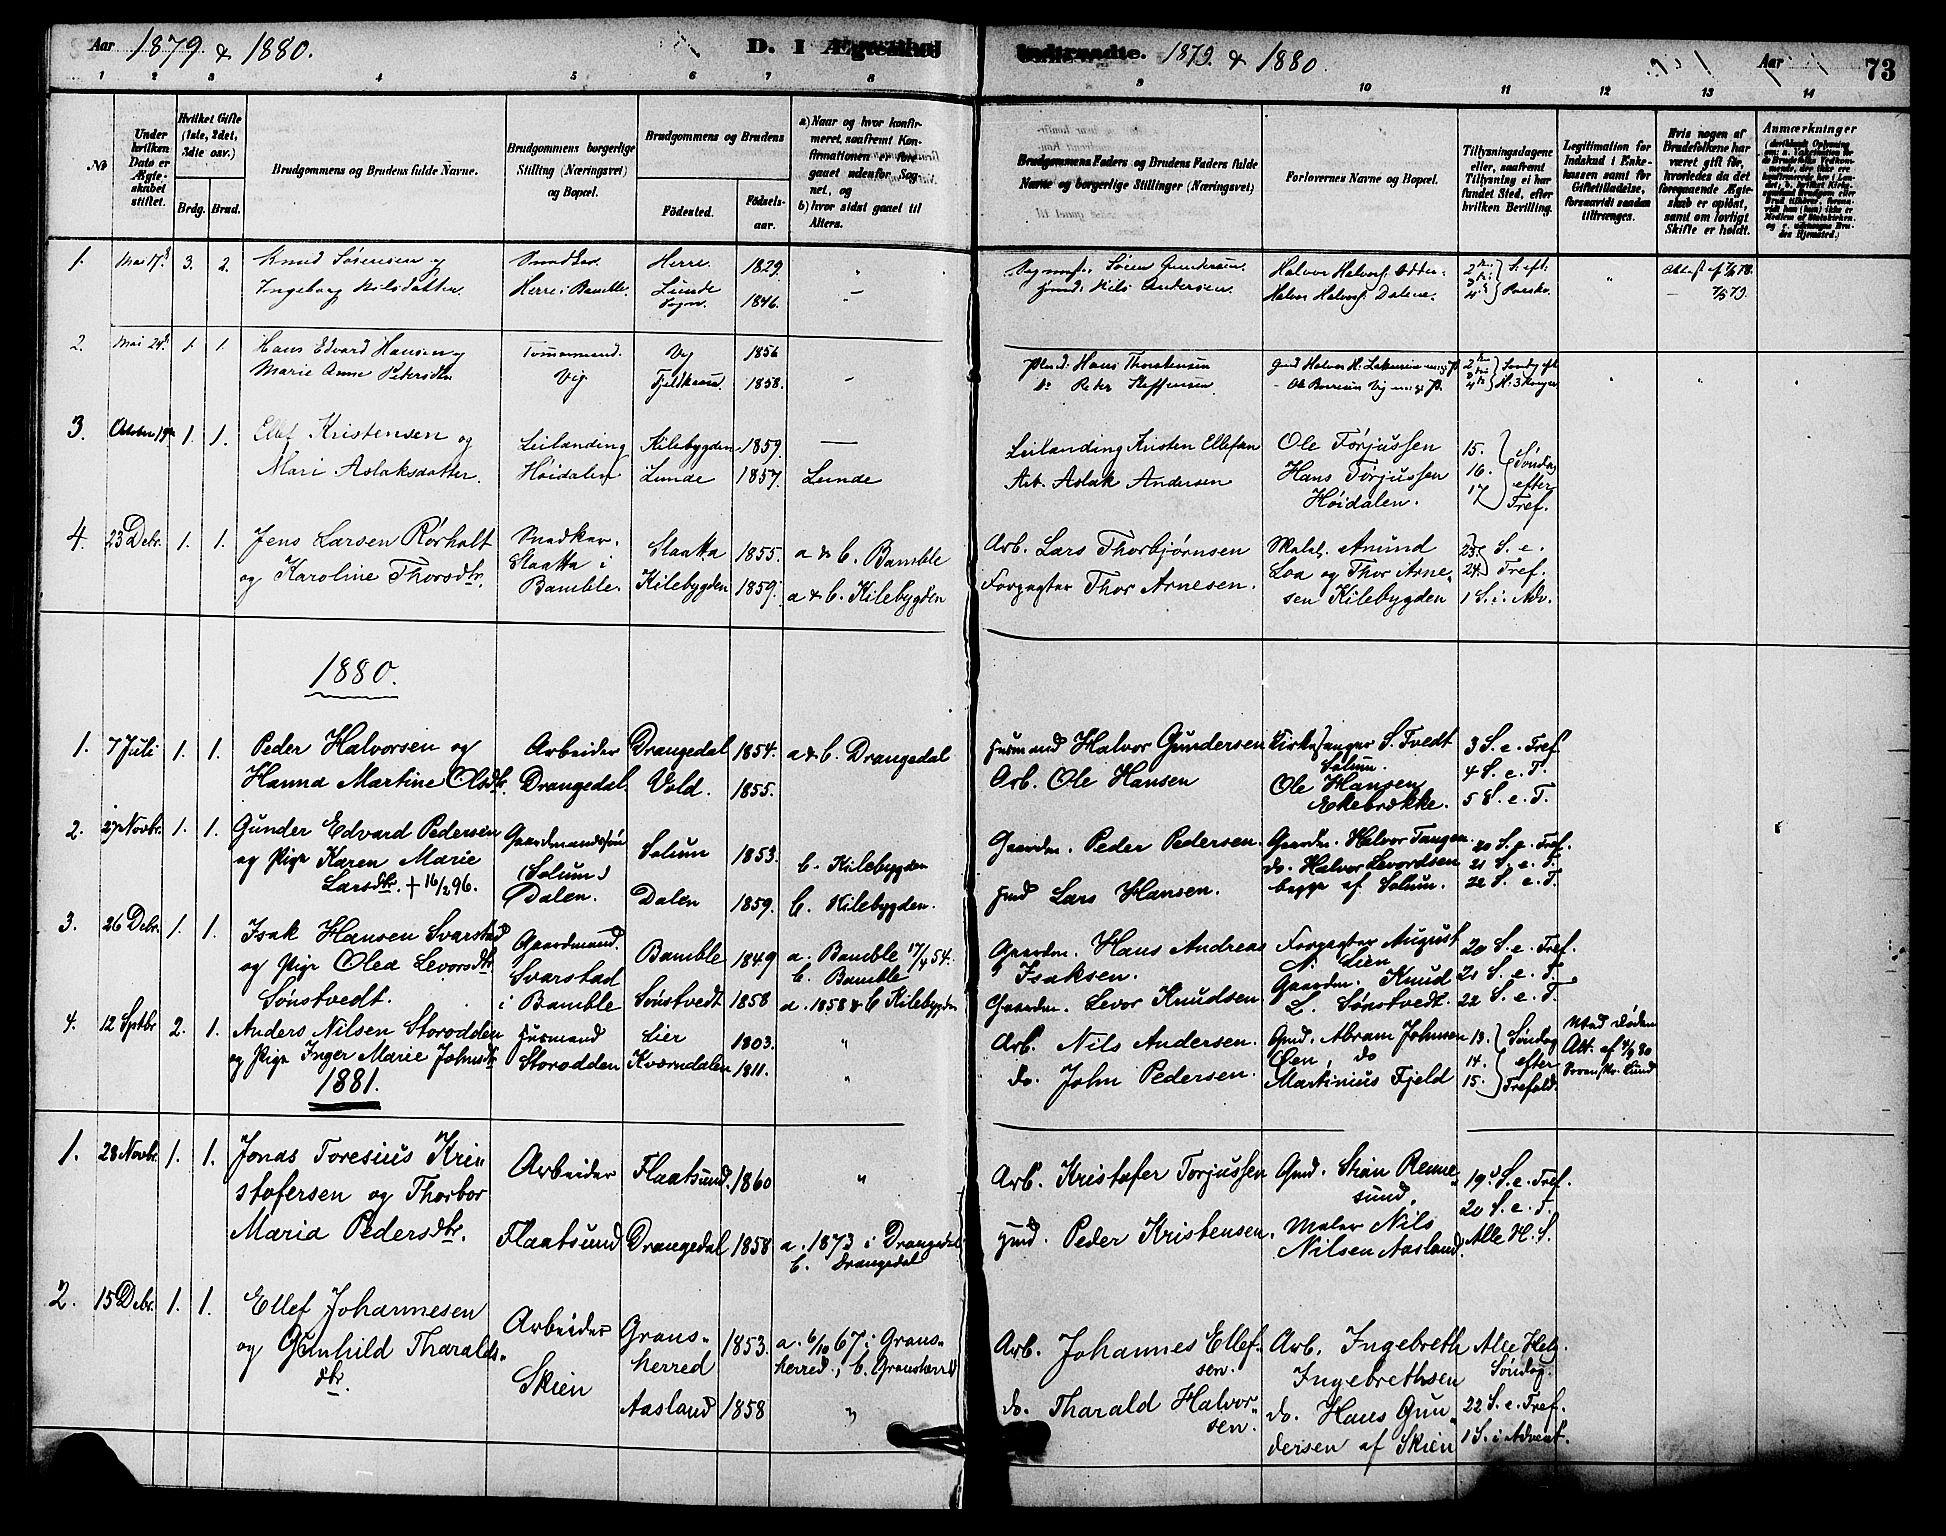 SAKO, Solum kirkebøker, F/Fc/L0001: Ministerialbok nr. III 1, 1877-1891, s. 73